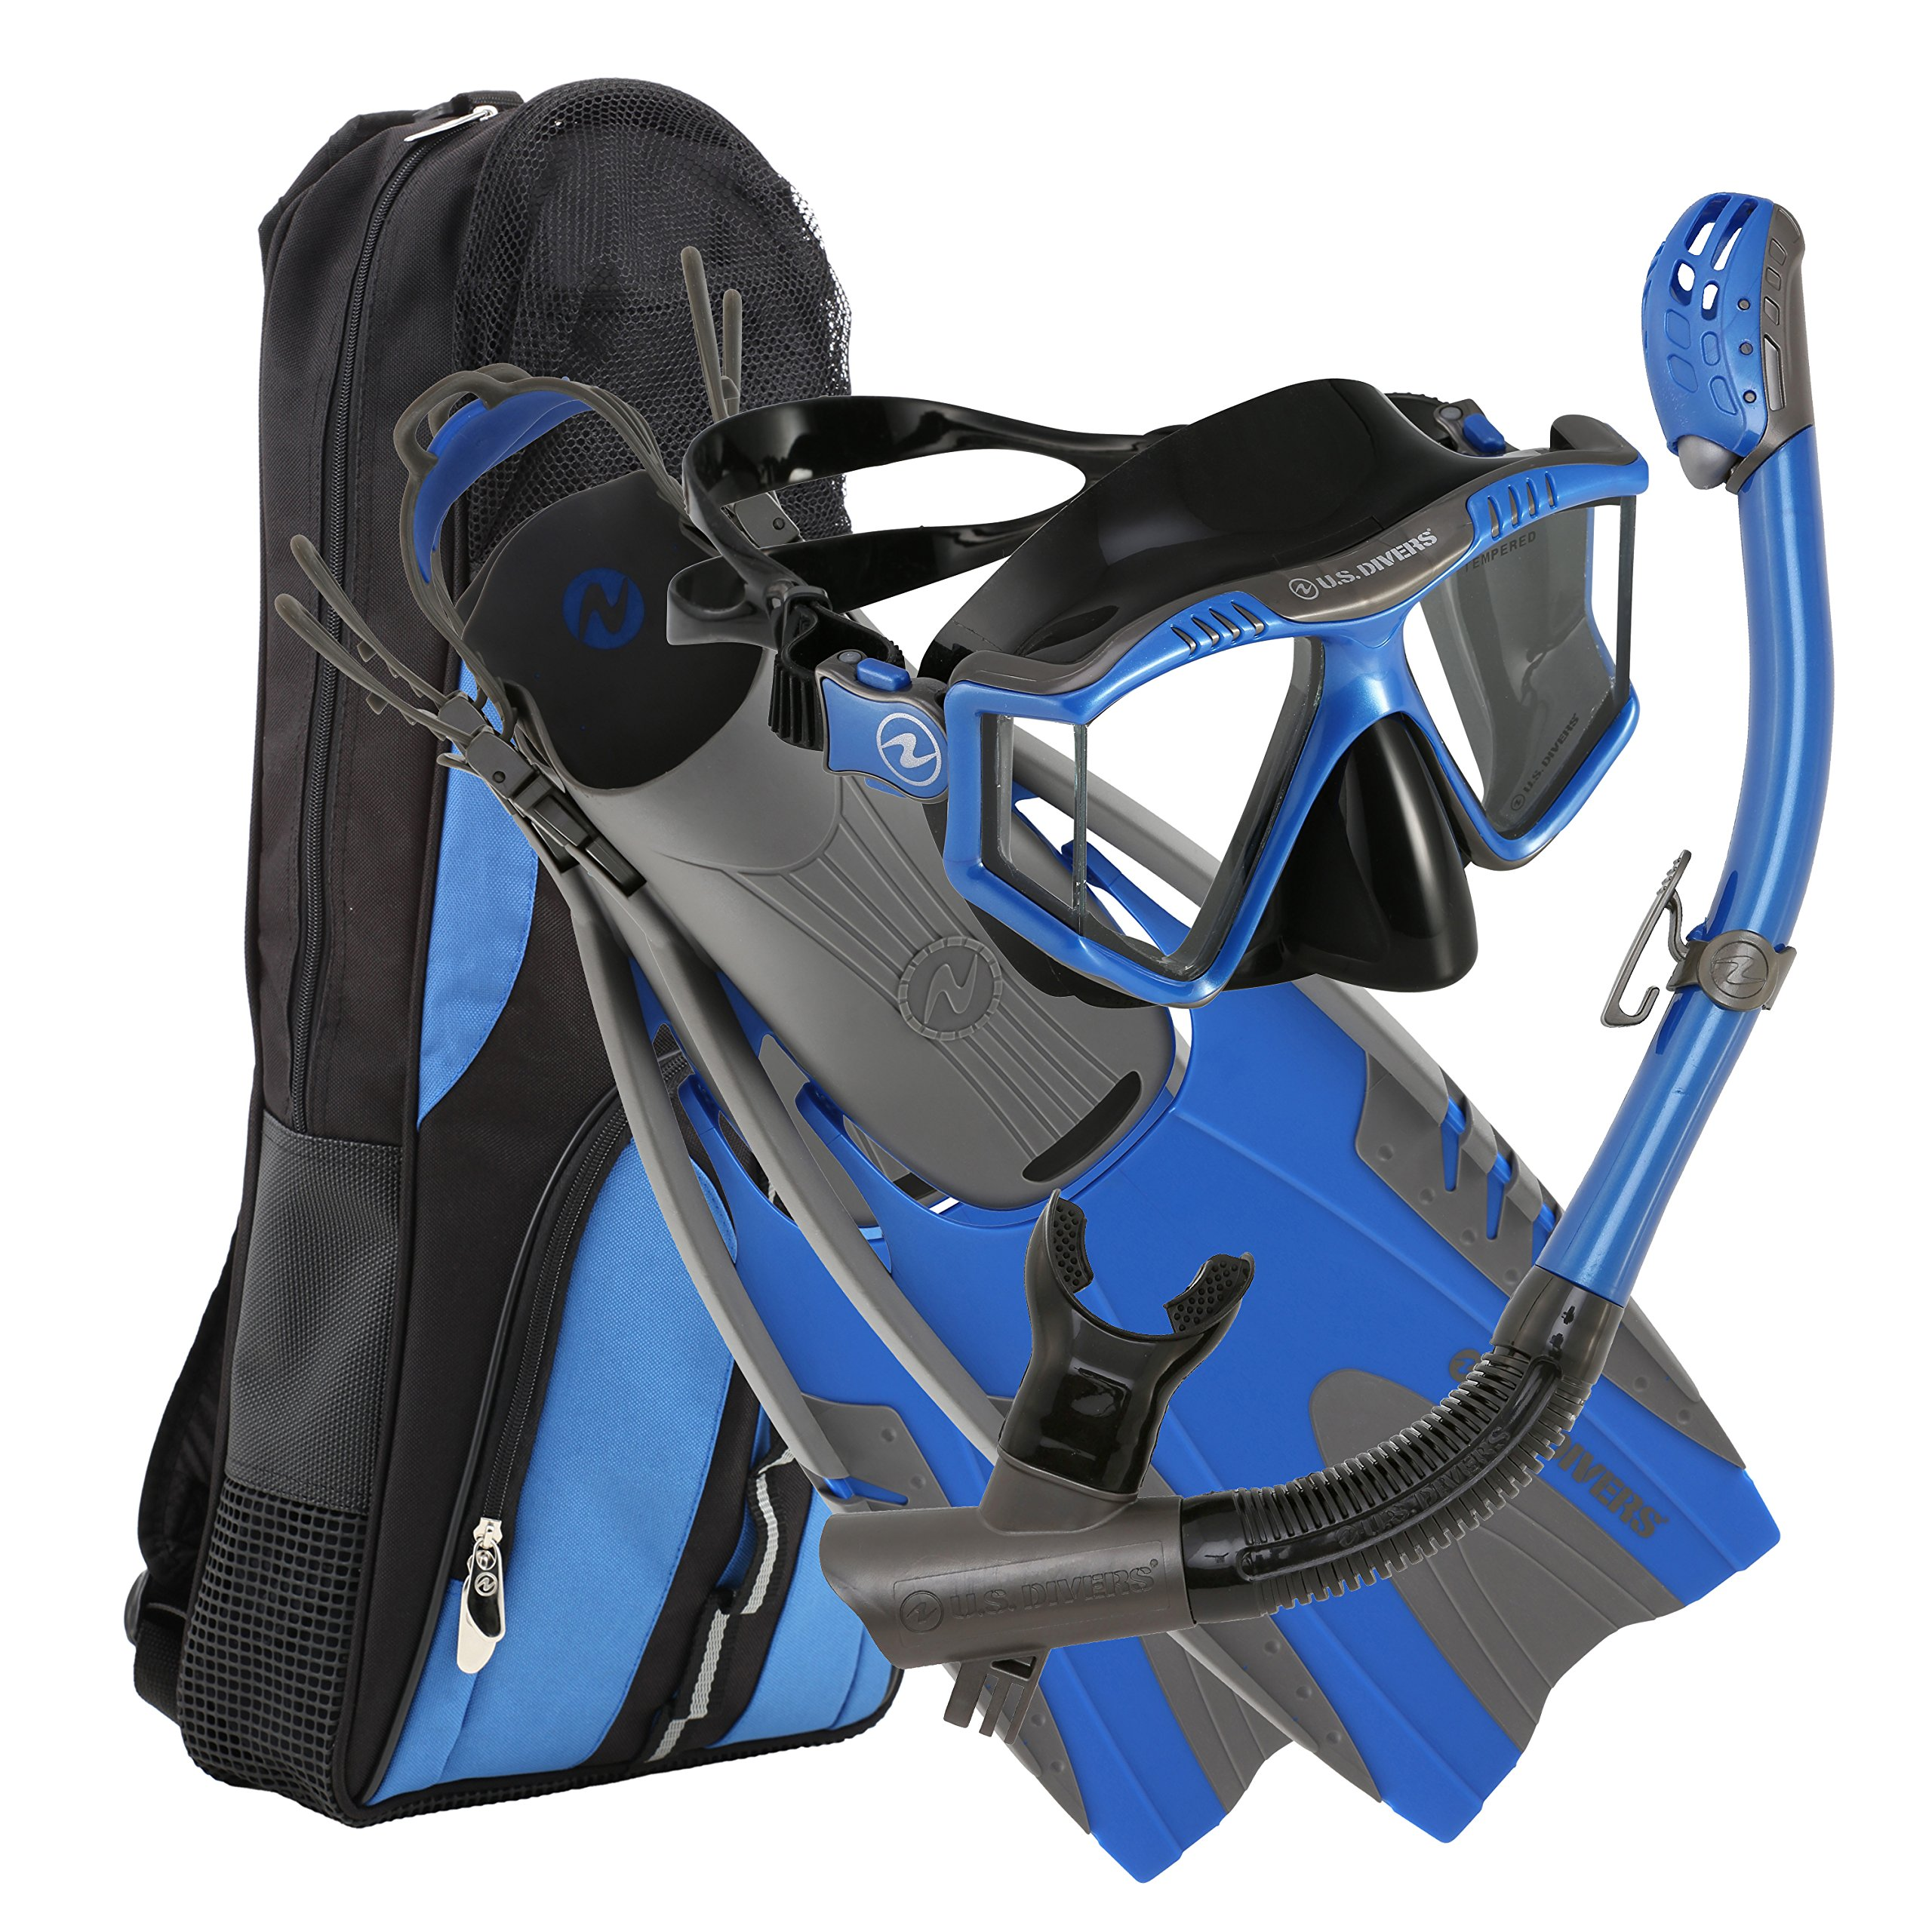 U.S. Divers Lux Mask Fins Snorkel Set Compatible with GoPro, Electric Blue, Large/X-Large by U.S. Divers